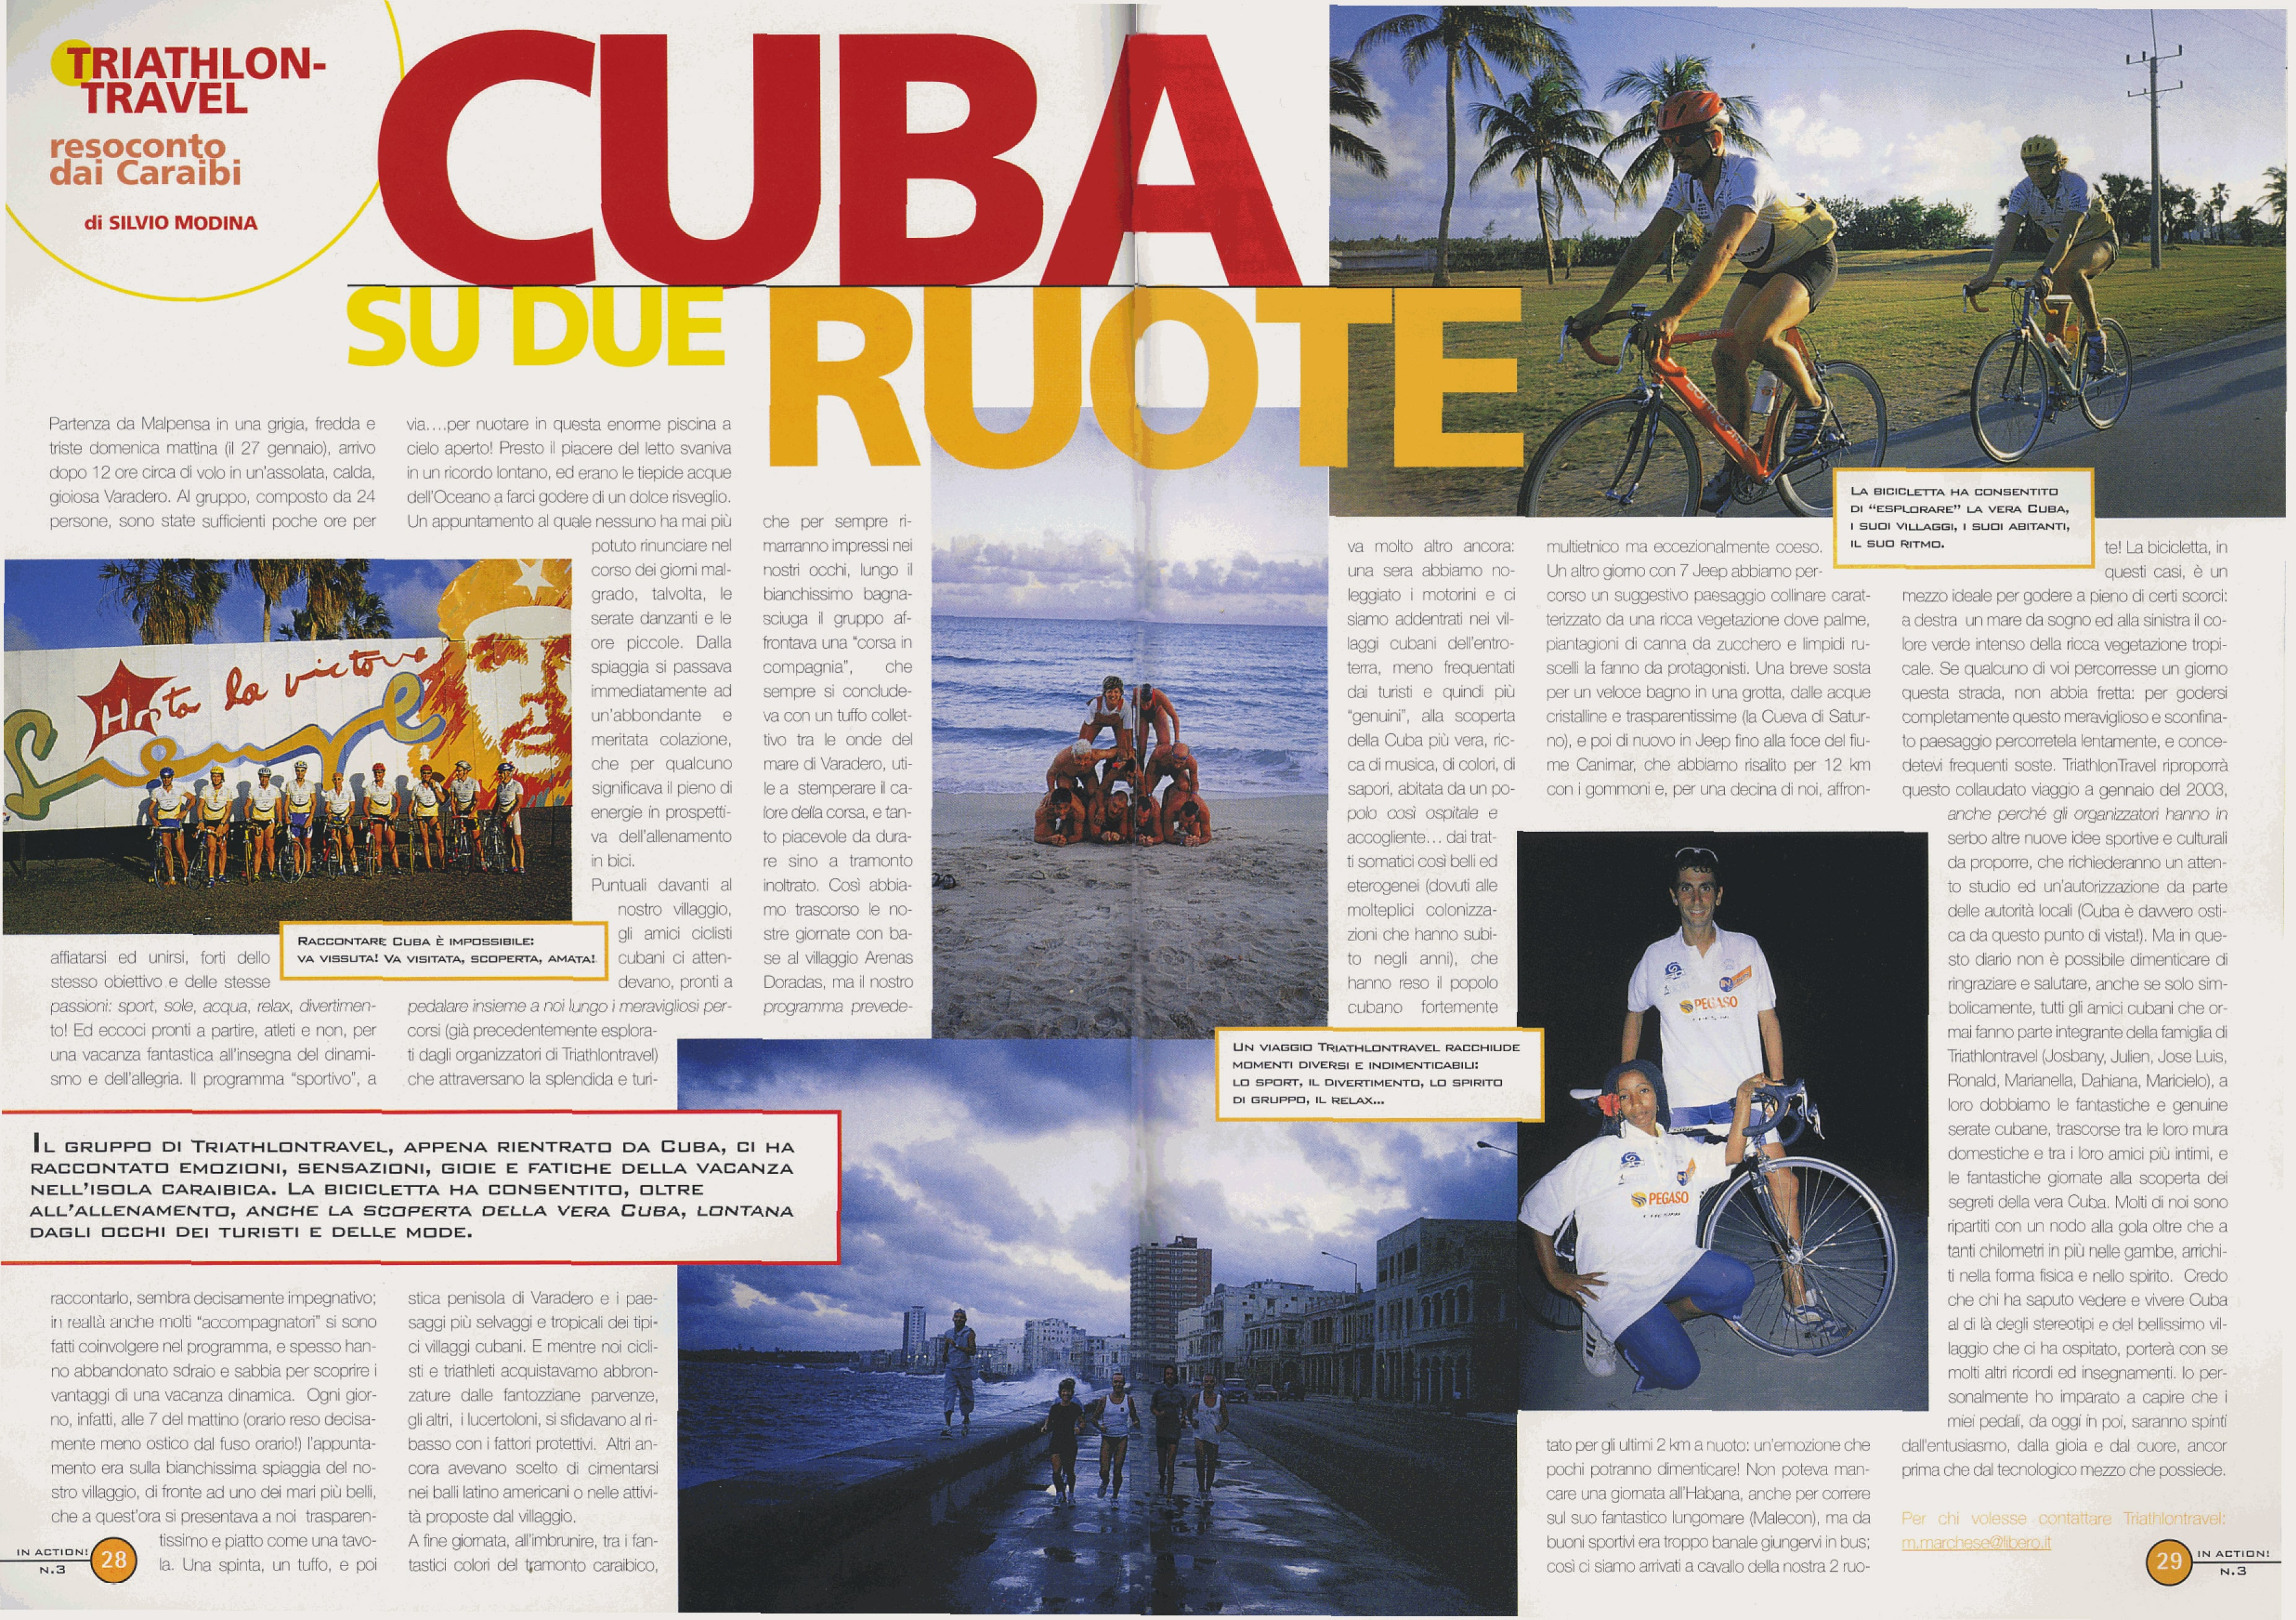 Cuba Triathlontravel